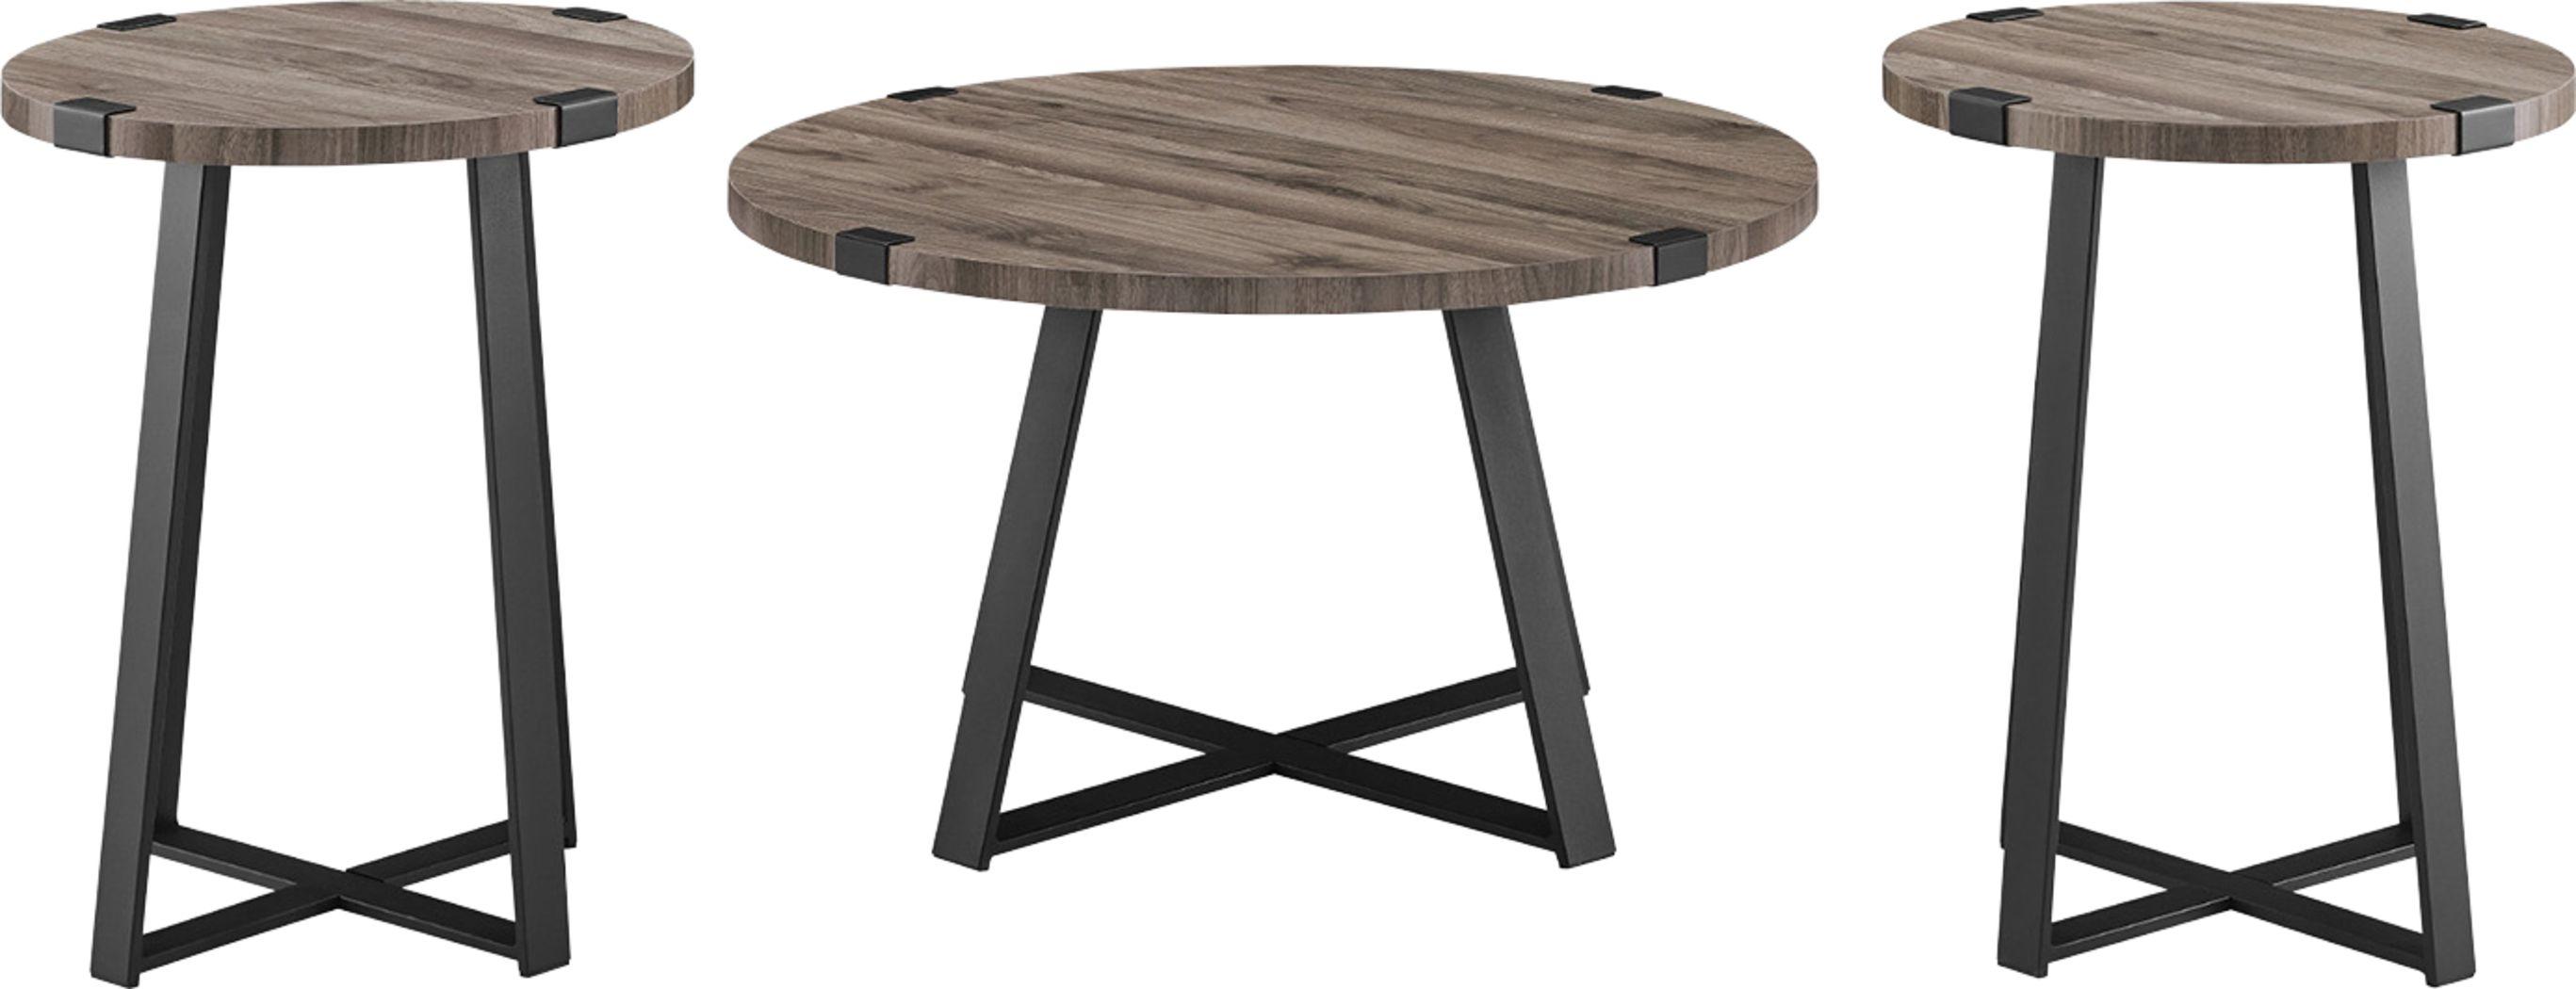 Castletroy Slate Cocktail Table Set